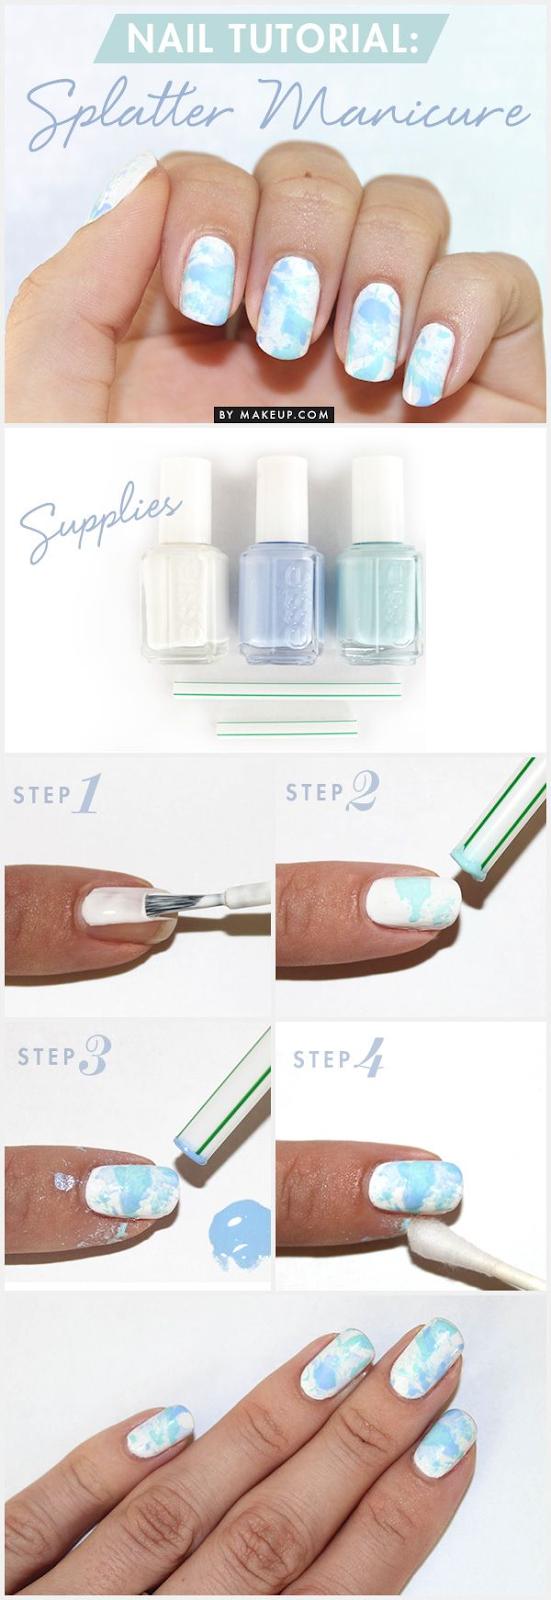 Top 10 Nail Art Designs